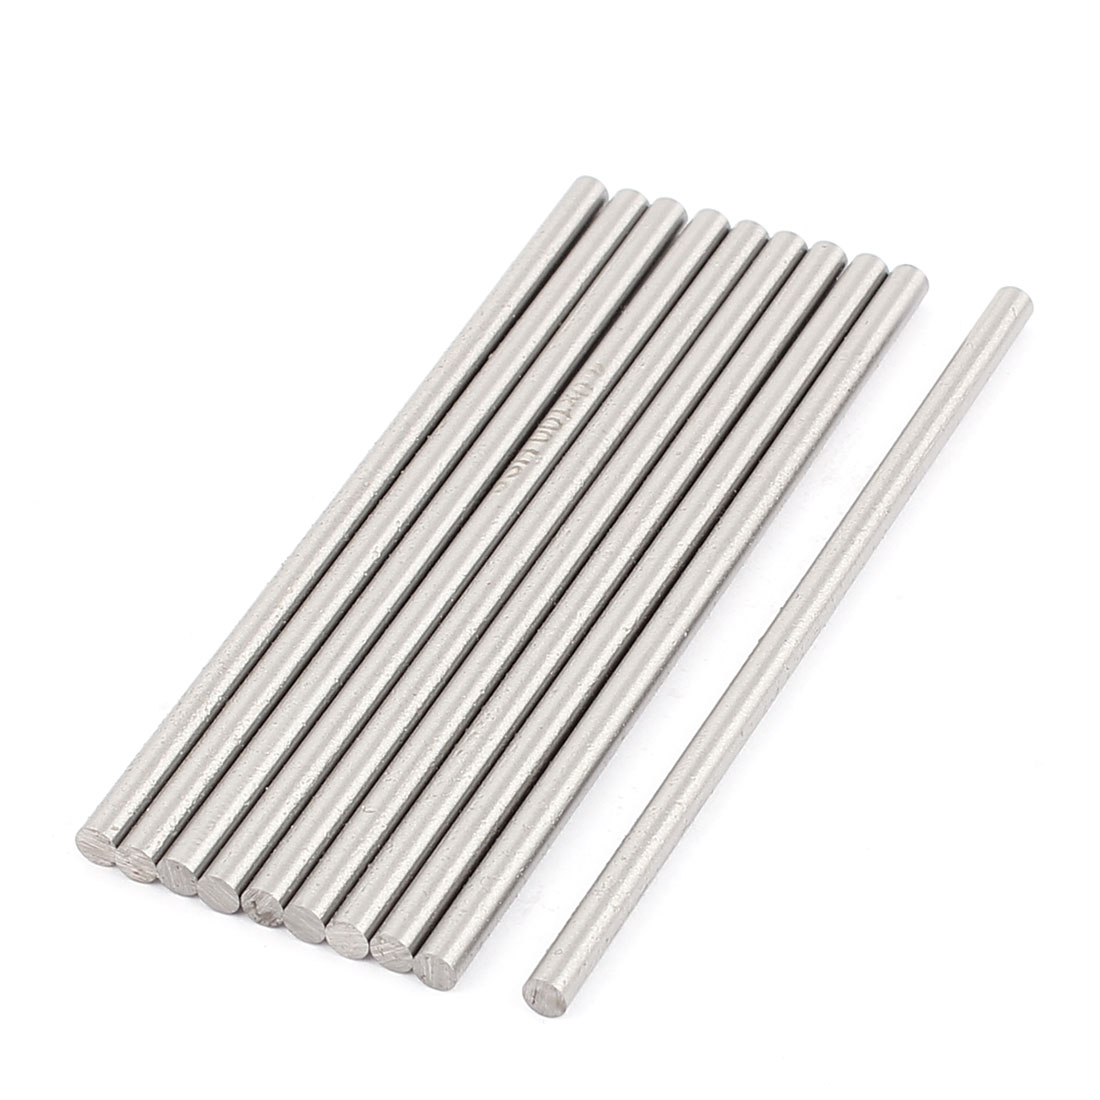 10pcs DIY RC Car Toy Model 100x4mm Straight Metal Round Shaft Rod Bars